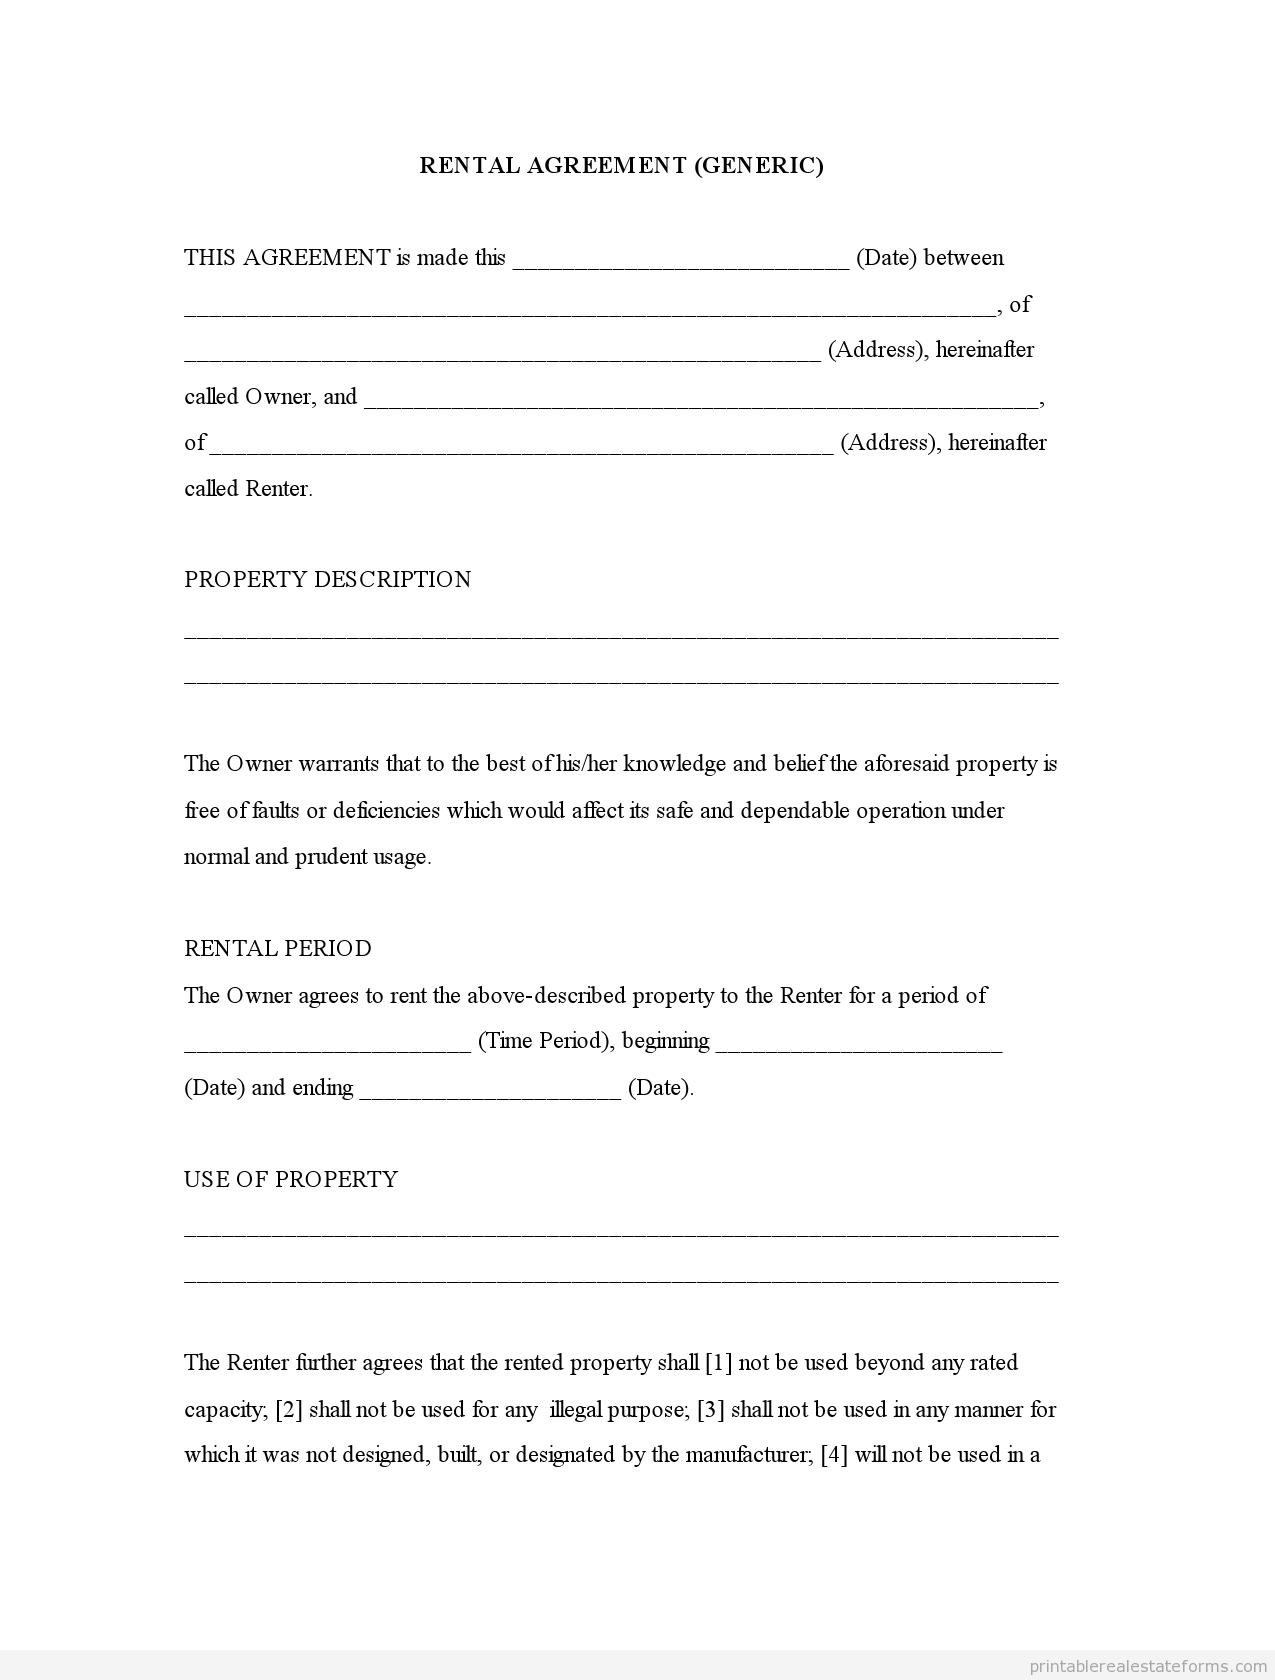 Free Printable Rental Agreement | Rental Agreement (Generic)0001 - Rental Agreement Forms Free Printable